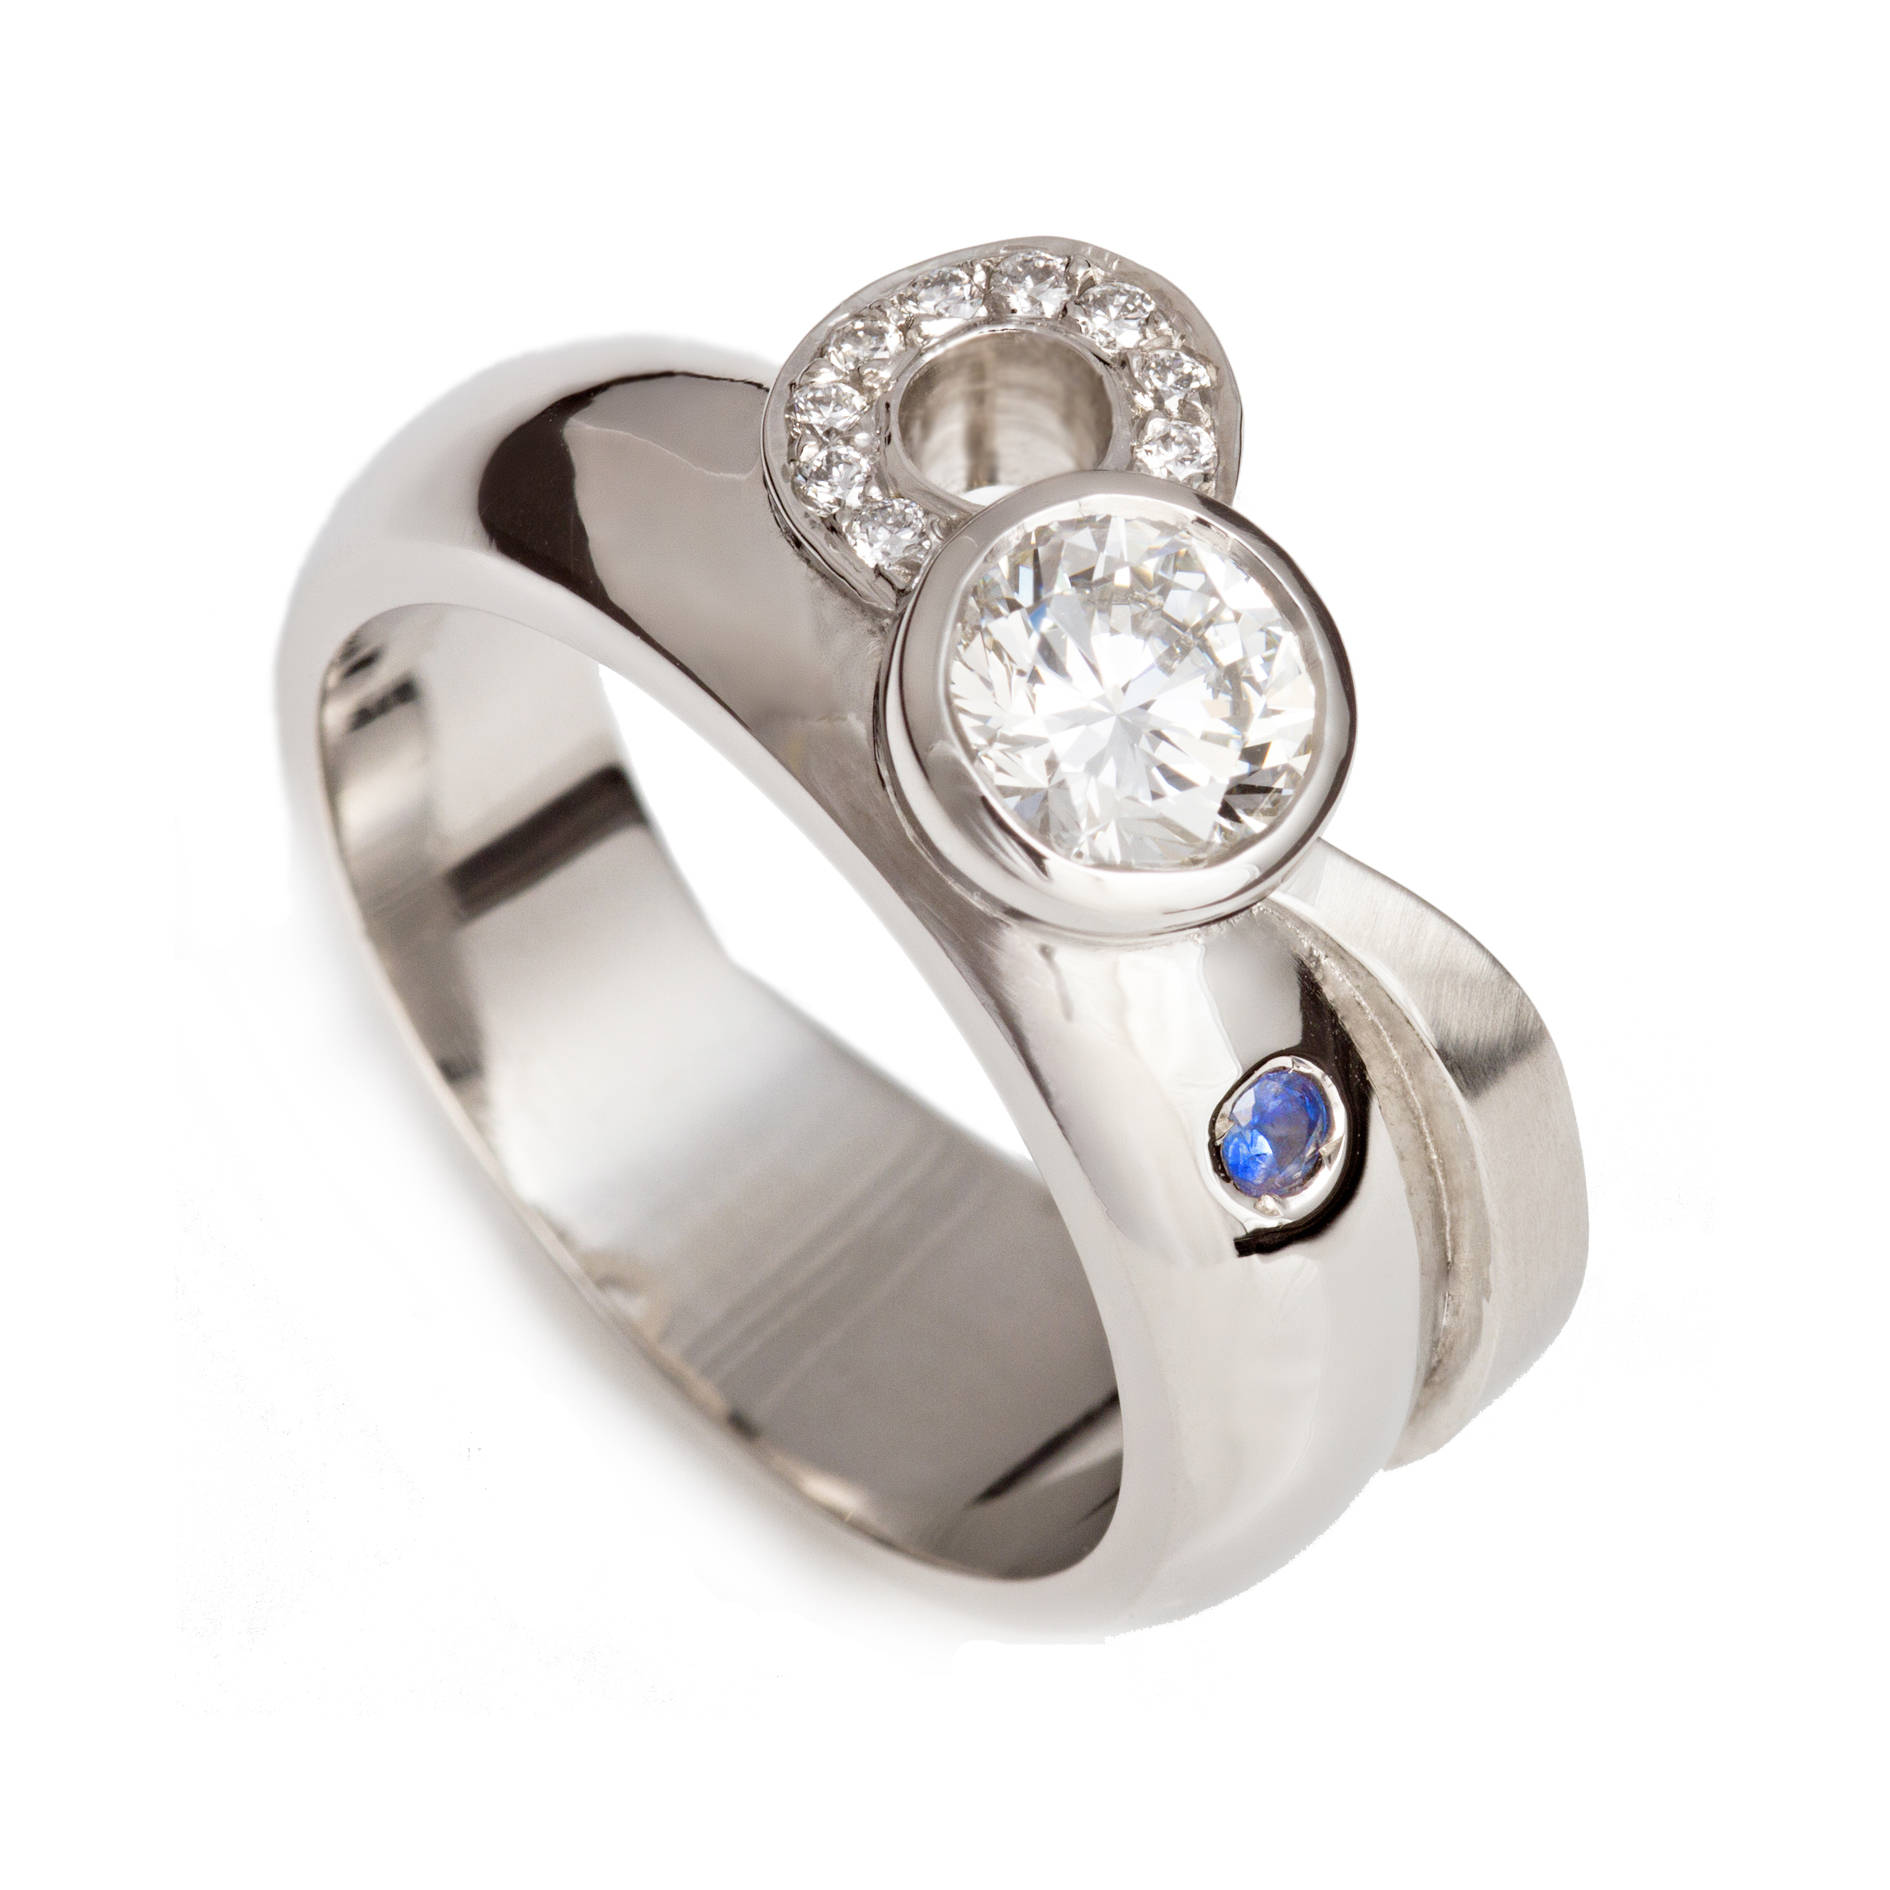 Bespoke platinum, diamond and sapphire ring commission